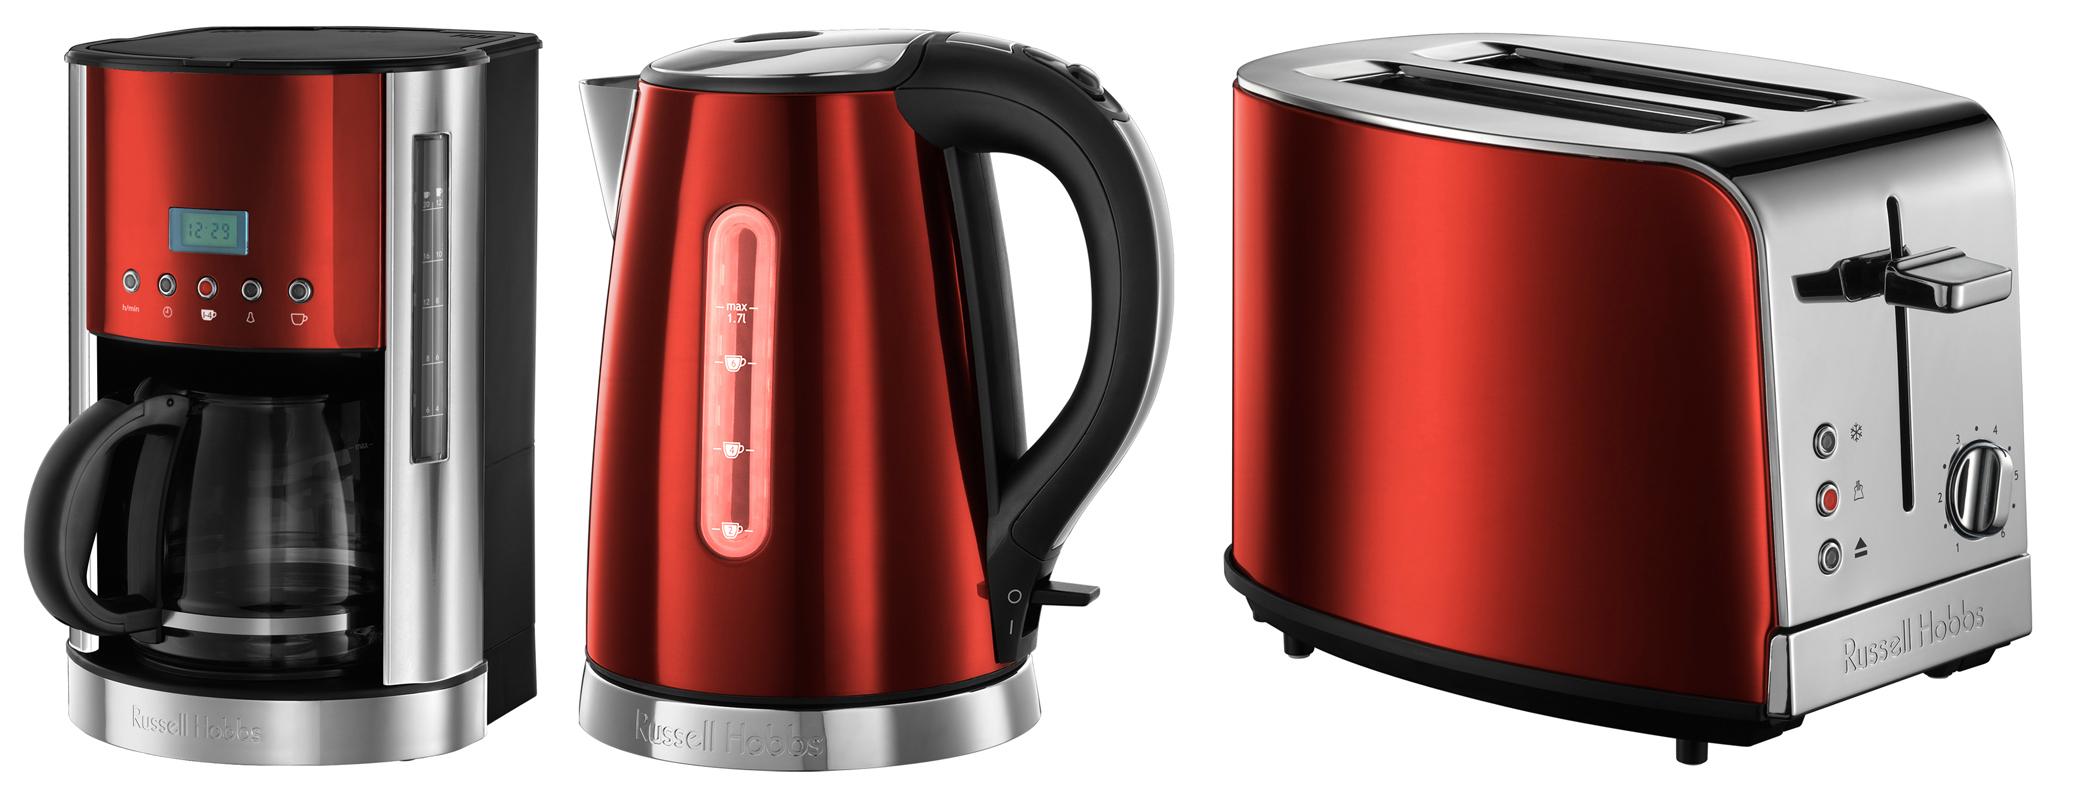 russell hobbs jewels fr hst cksserie mit kaffeemaschine wasserkocher toaster. Black Bedroom Furniture Sets. Home Design Ideas